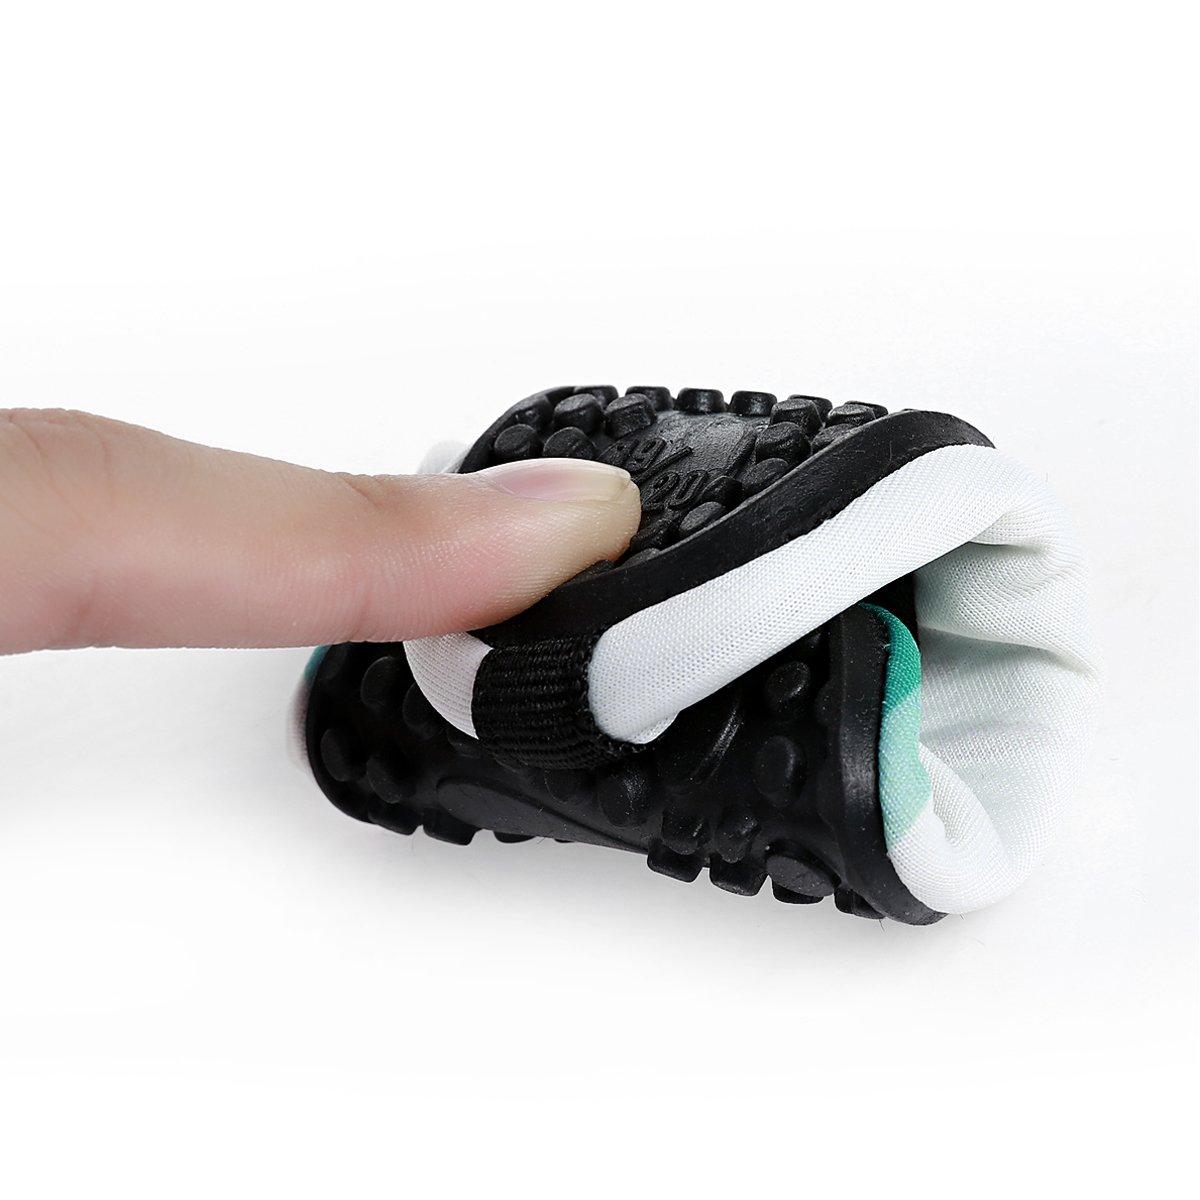 Amazon.com   L-RUN Unisex Swimming Shoes Barefoot Beach Shoes White US 18-24 Months=EU 21-22   Walking